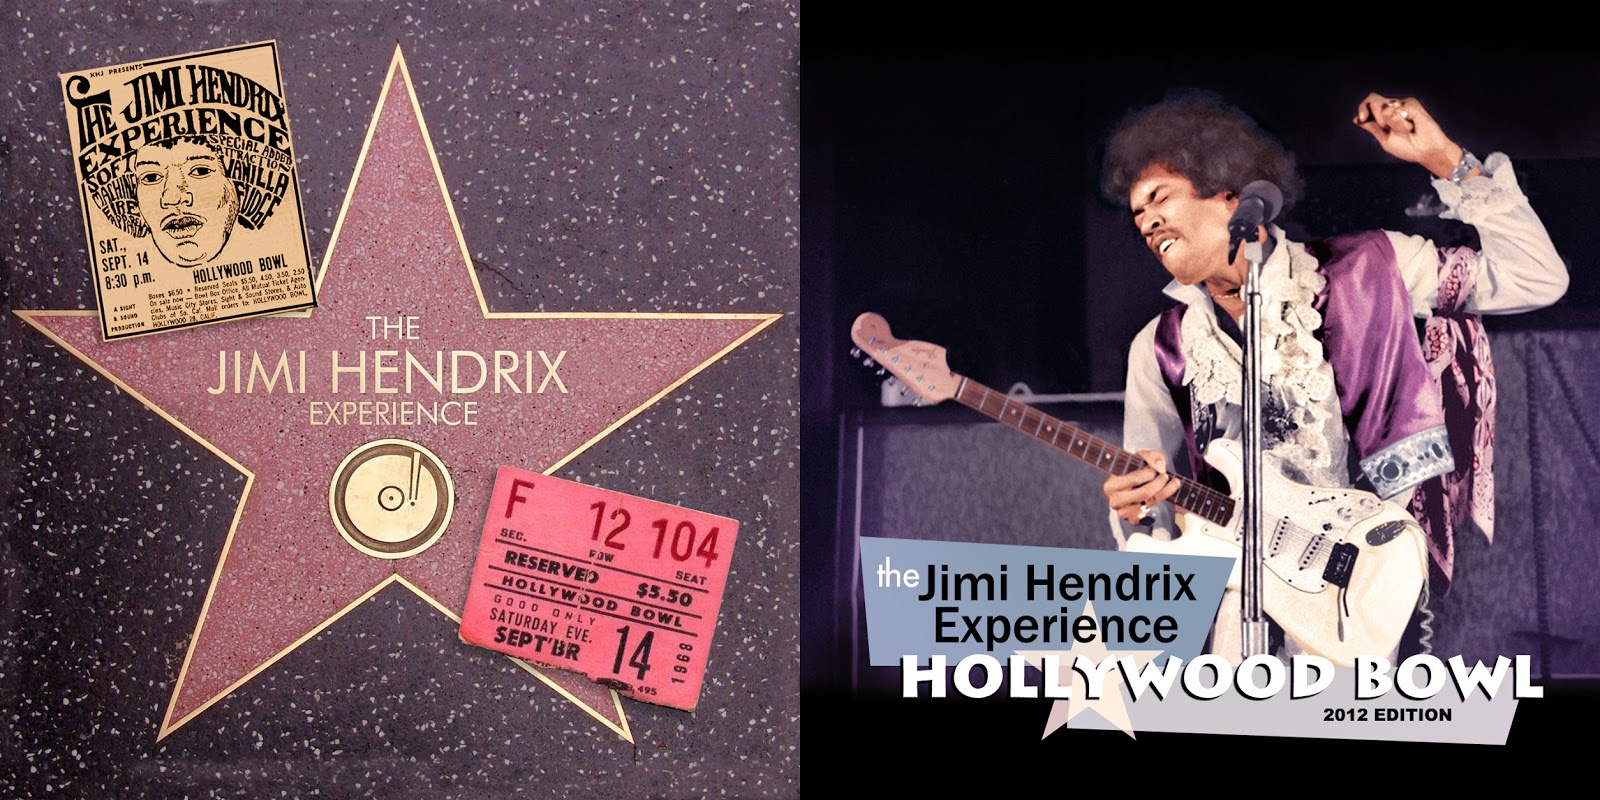 RELIQUARY: Jimi Hendrix [1968 09 14] Hollywood Bowl 2012 Edition